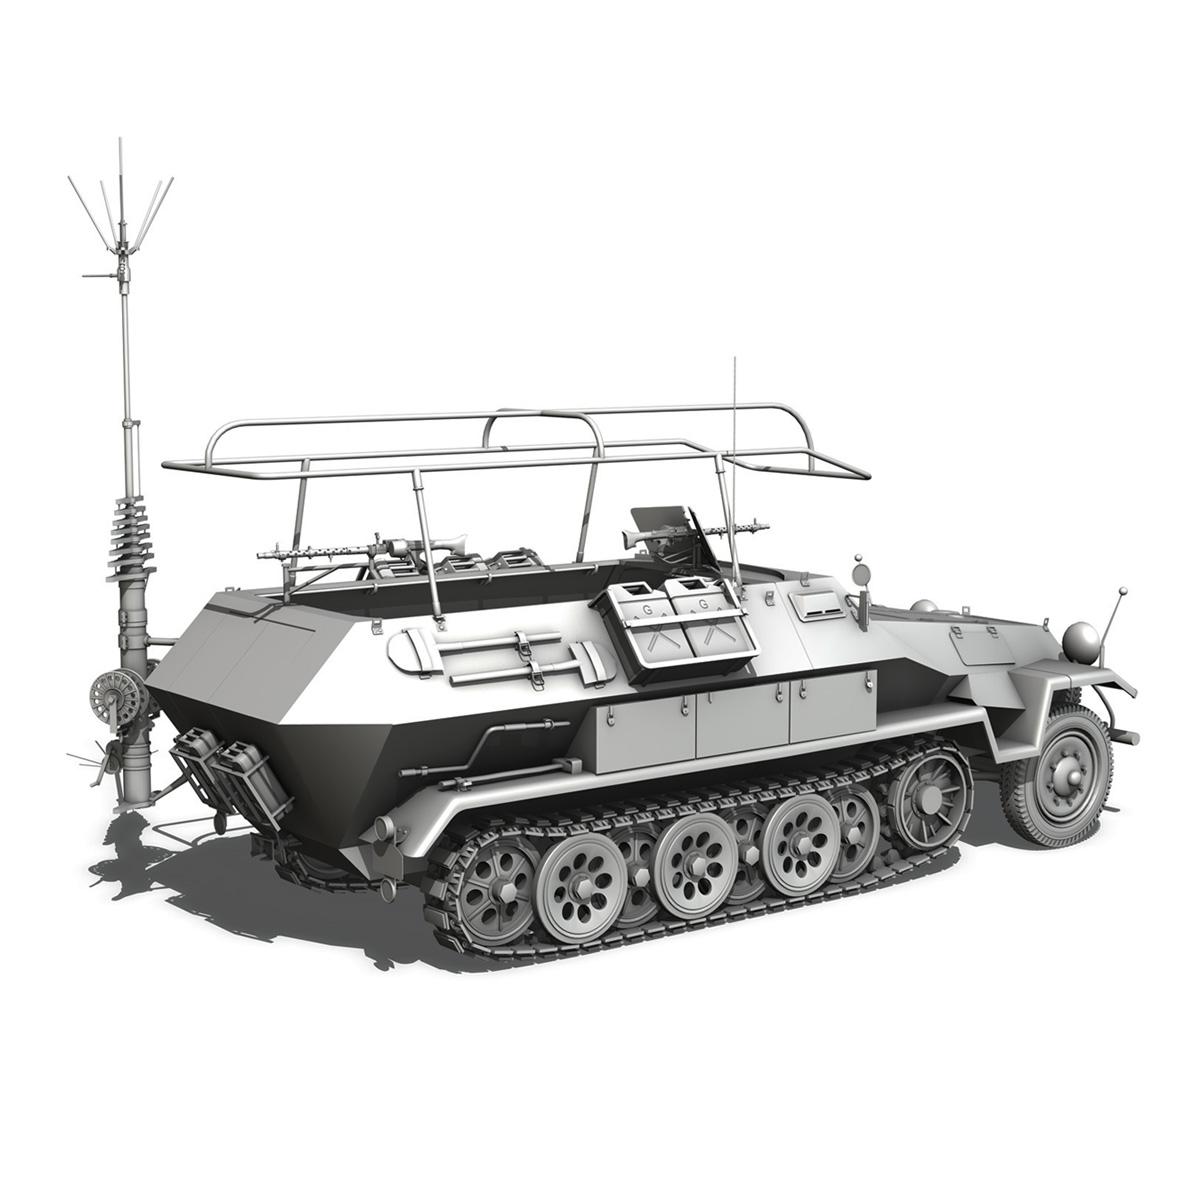 sdkfz 251 ausf.b – communications vehicle 3d model 3ds fbx c4d lwo obj 251697